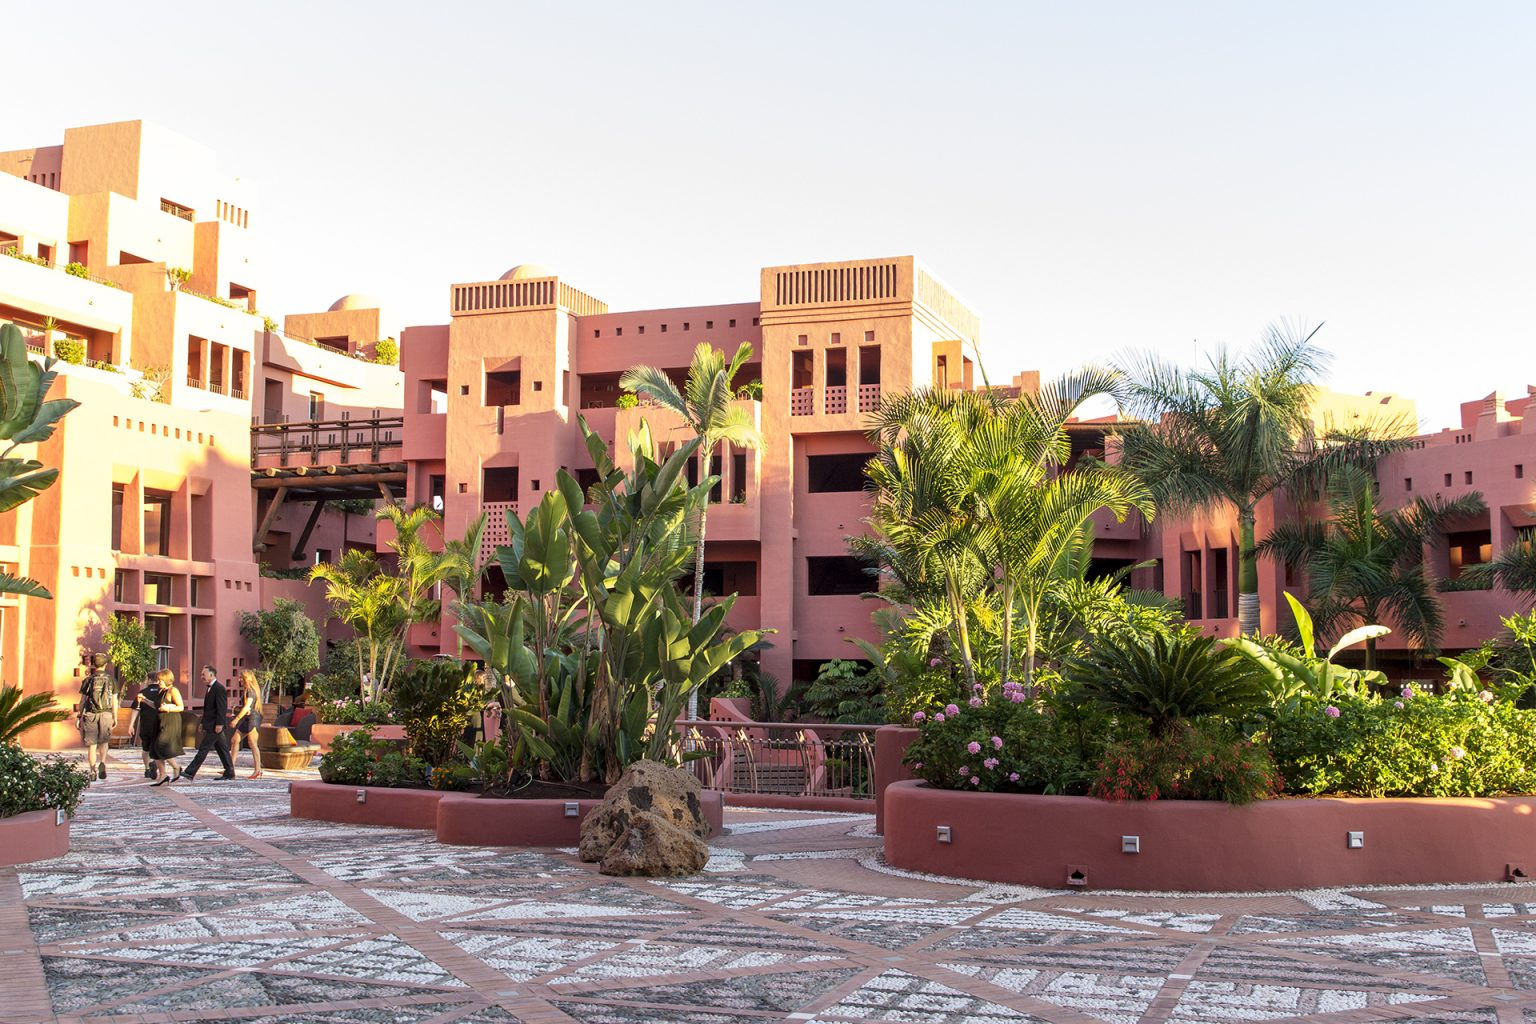 M.B., MB, Martin Berasategui, Tenerife, Canarie